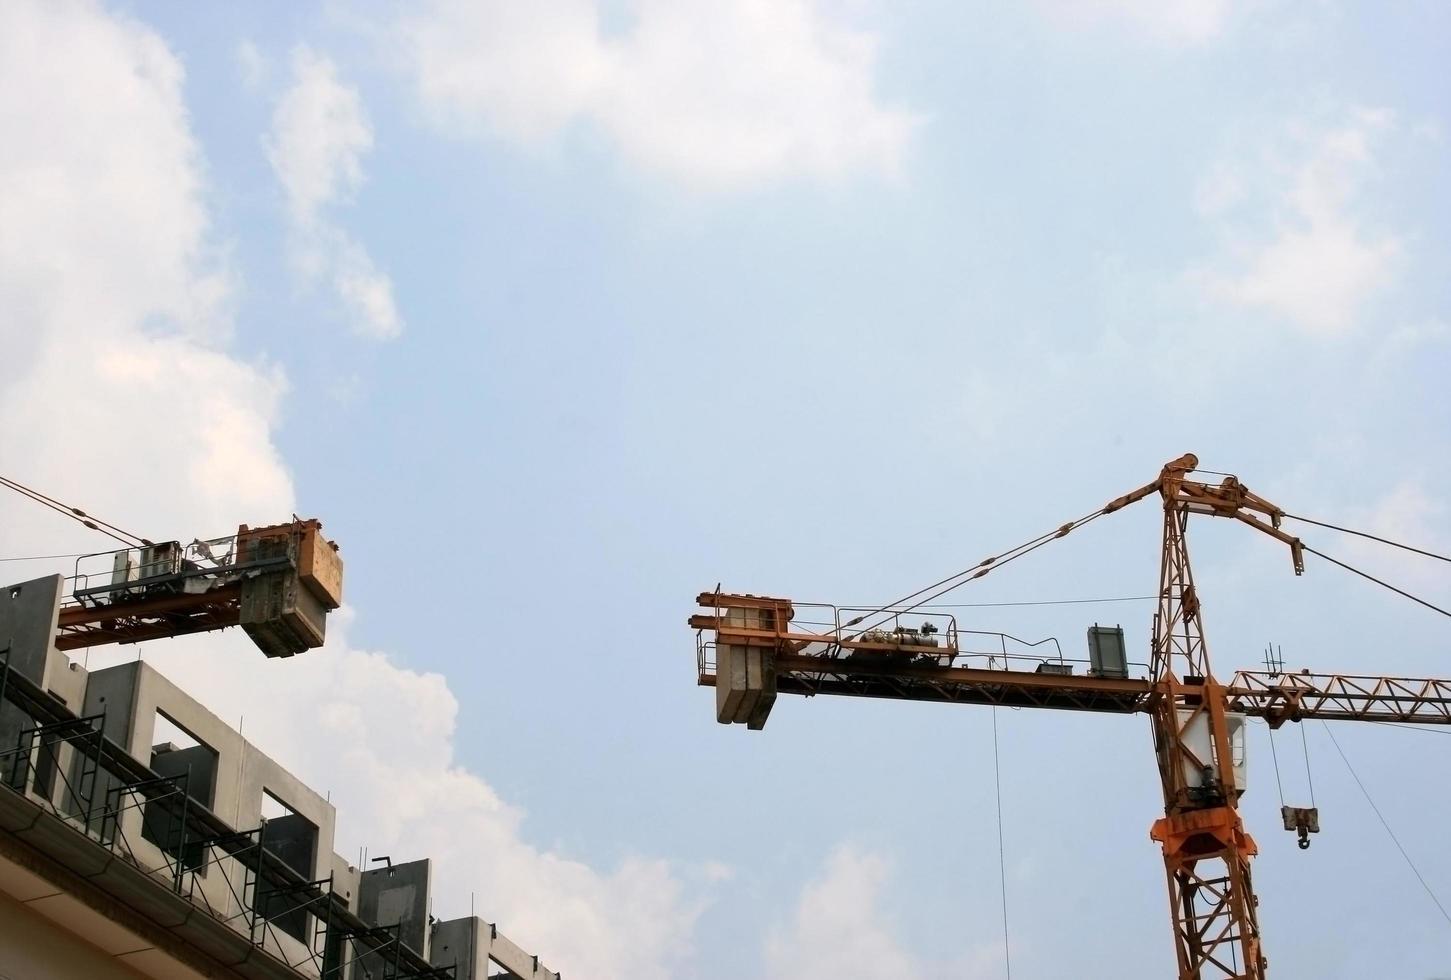 Cranes at construction site photo